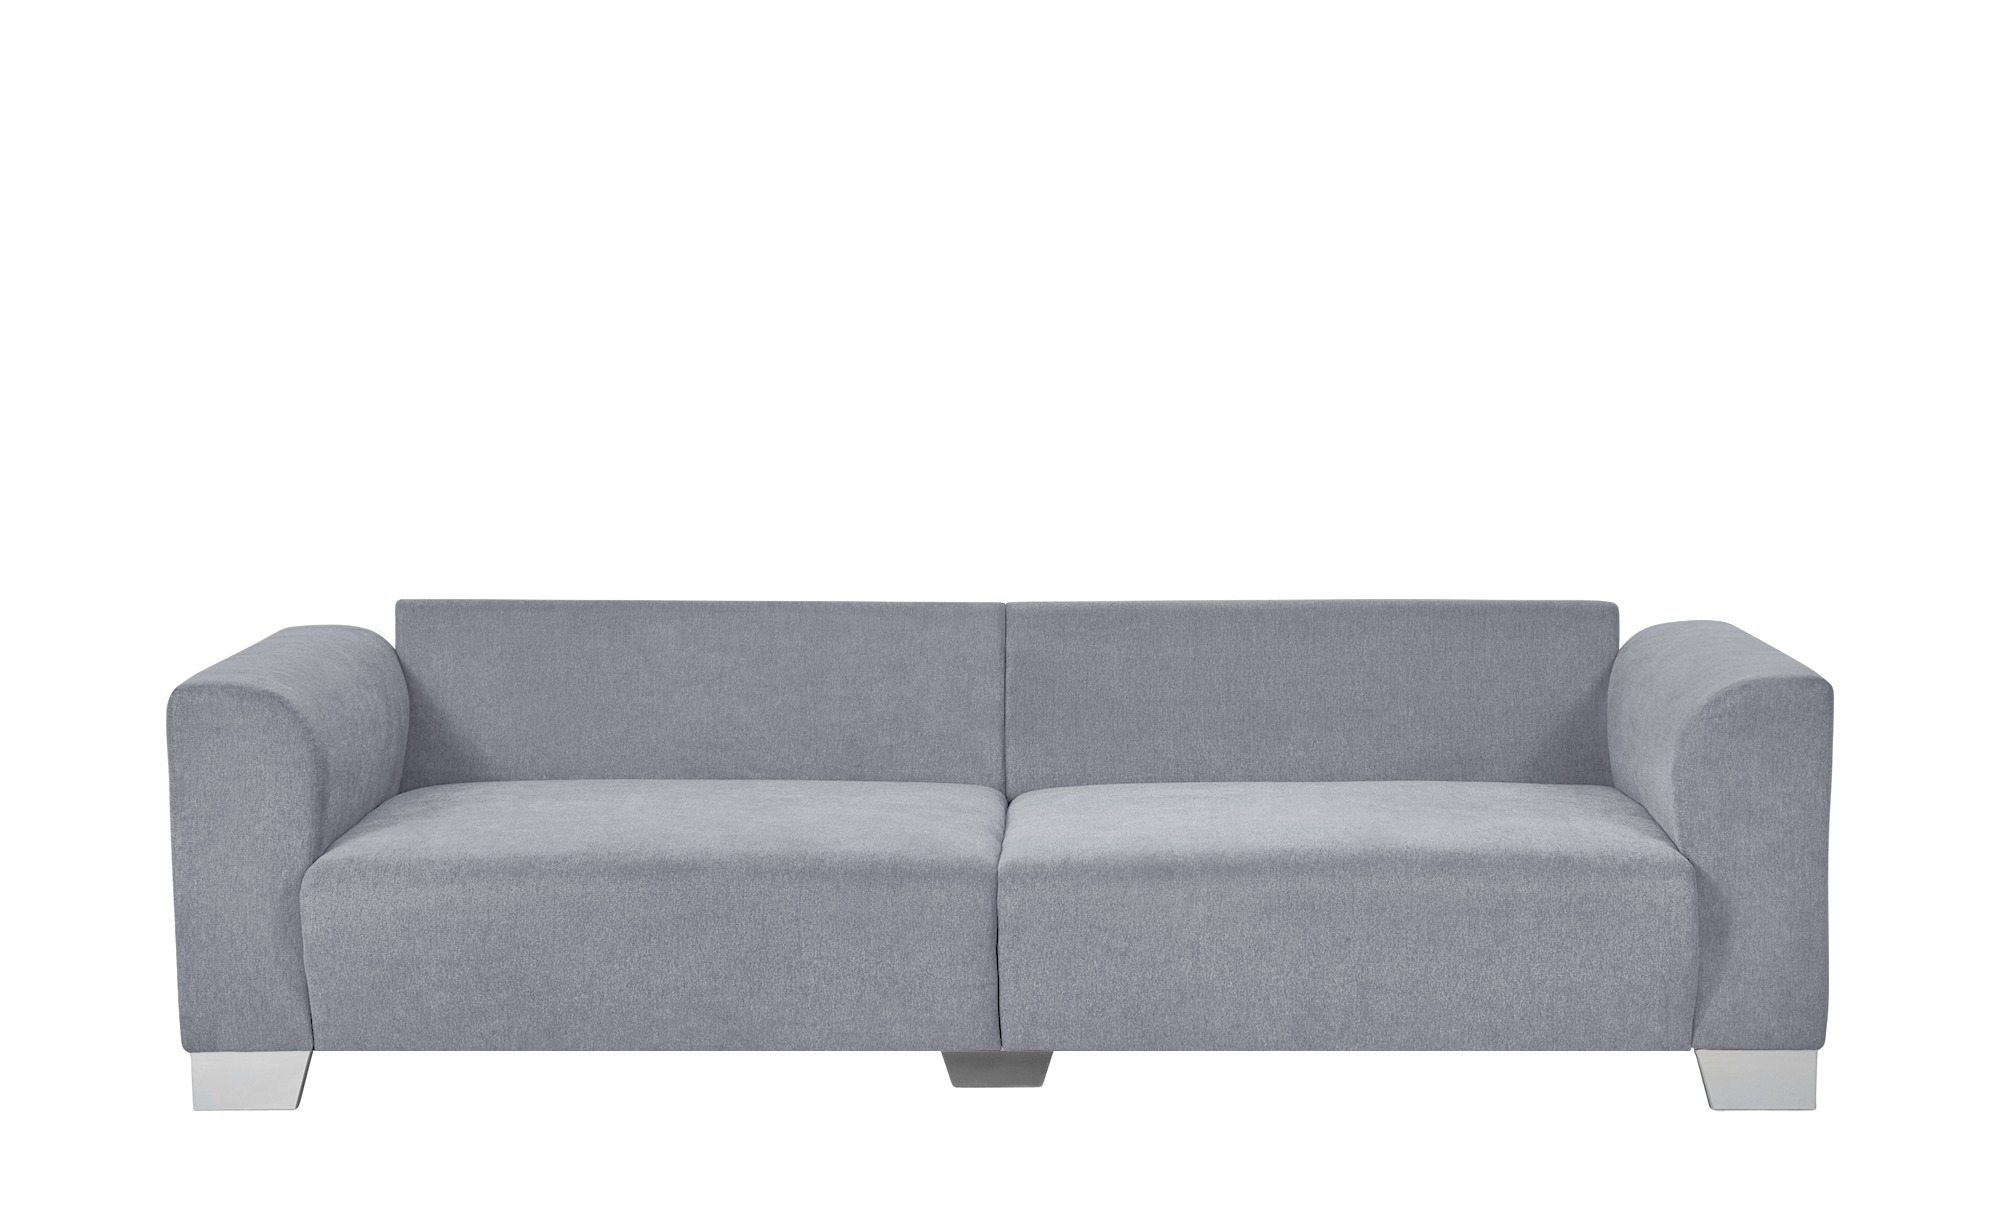 smart big sofa grau flachgewebe tonja silbergrau schlamm. Black Bedroom Furniture Sets. Home Design Ideas